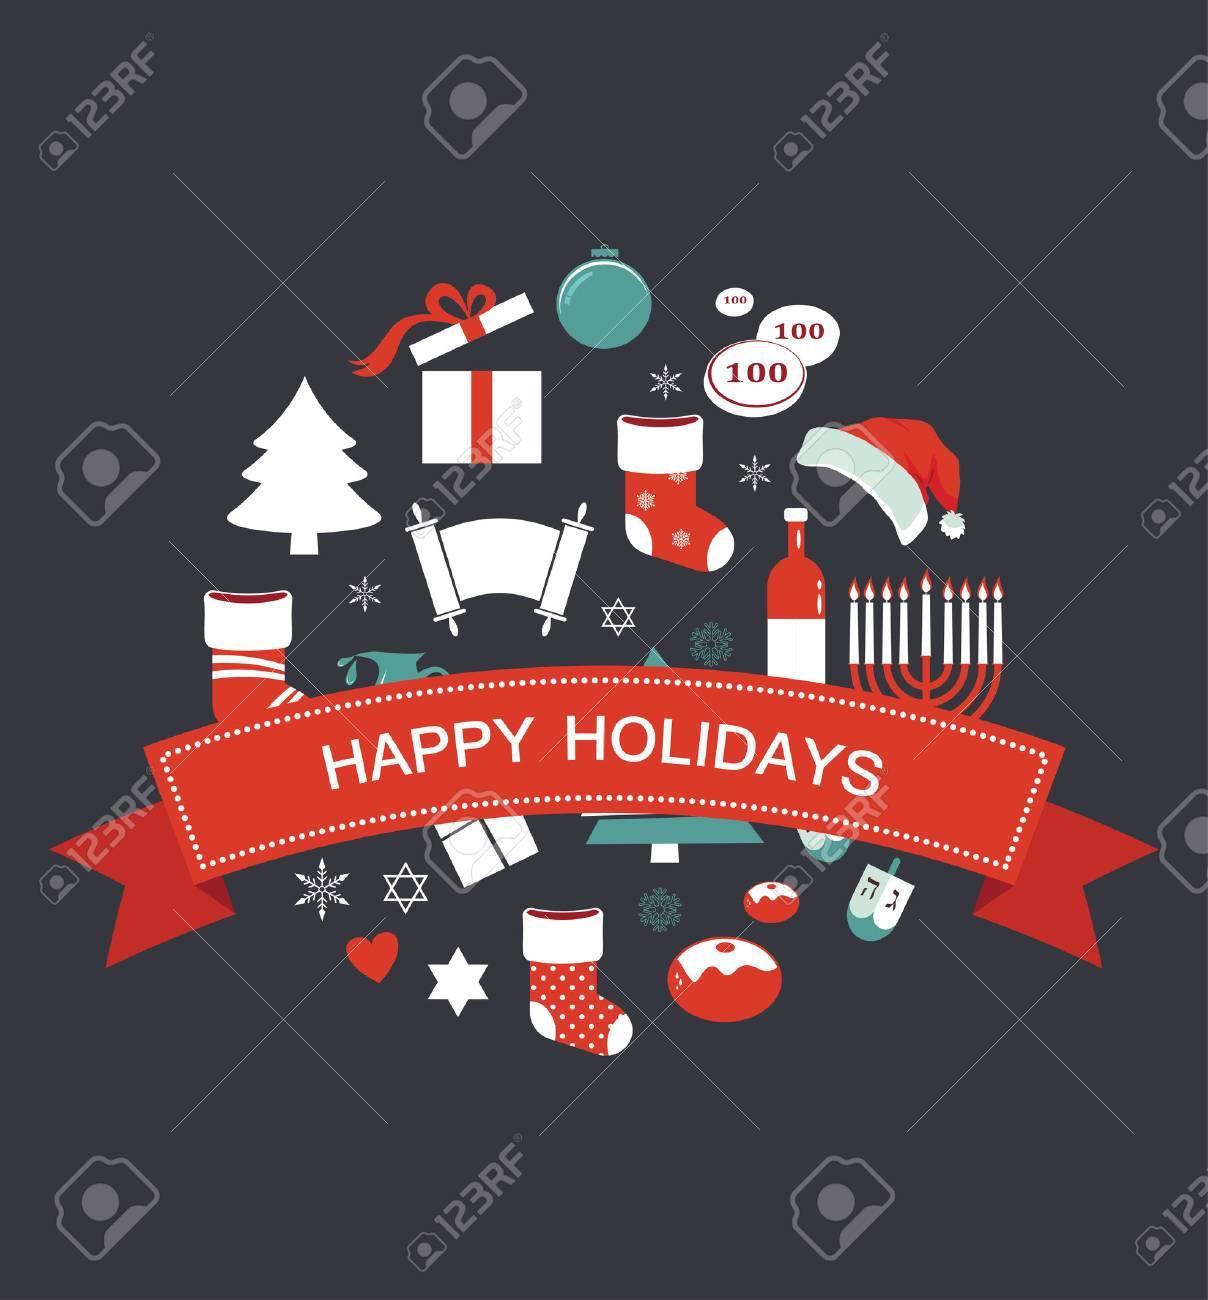 Hanukkah Christmas Stocking.Merry Christmas And Happy Hanukkah